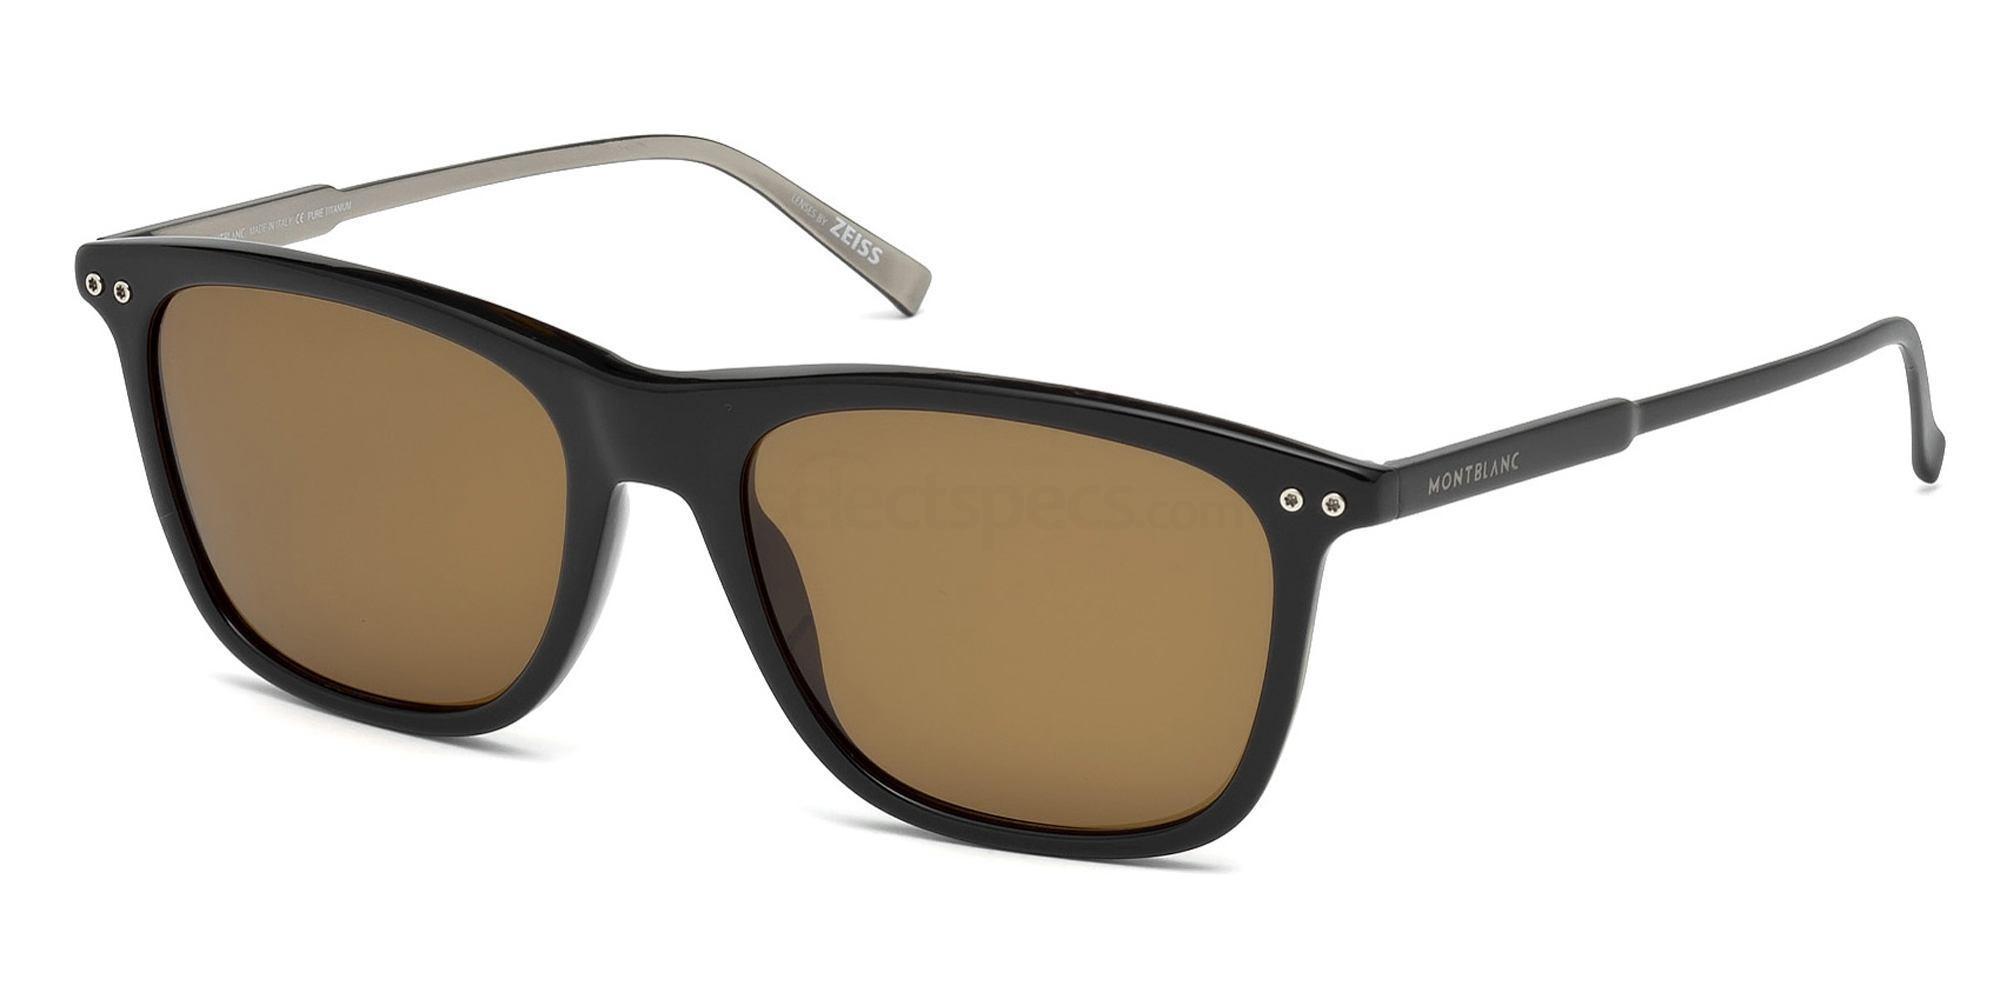 01M MB600S Sunglasses, Mont Blanc